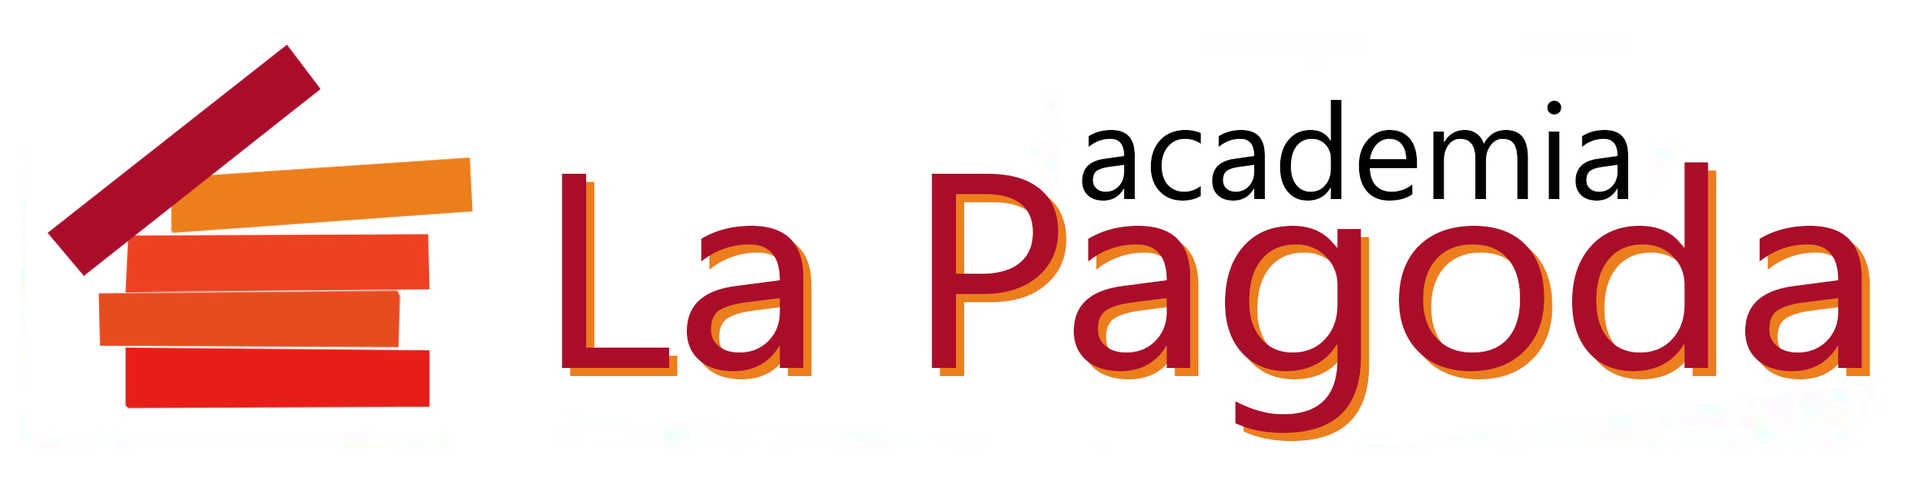 Academia La Pagoda - logo